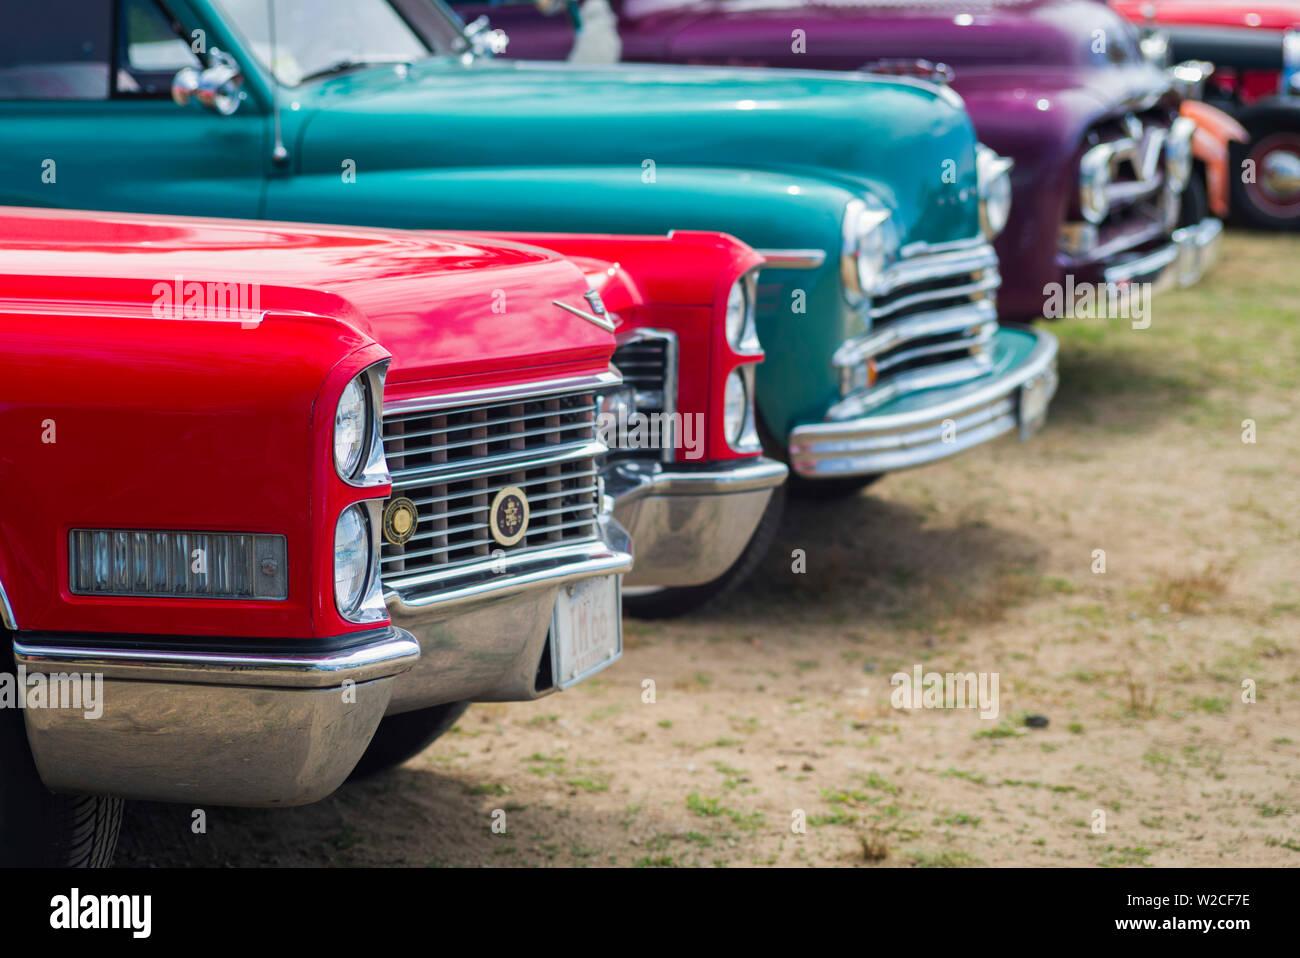 USA, Massachusetts, Cape Ann, Gloucester, Antique car show, voitures anciennes Photo Stock